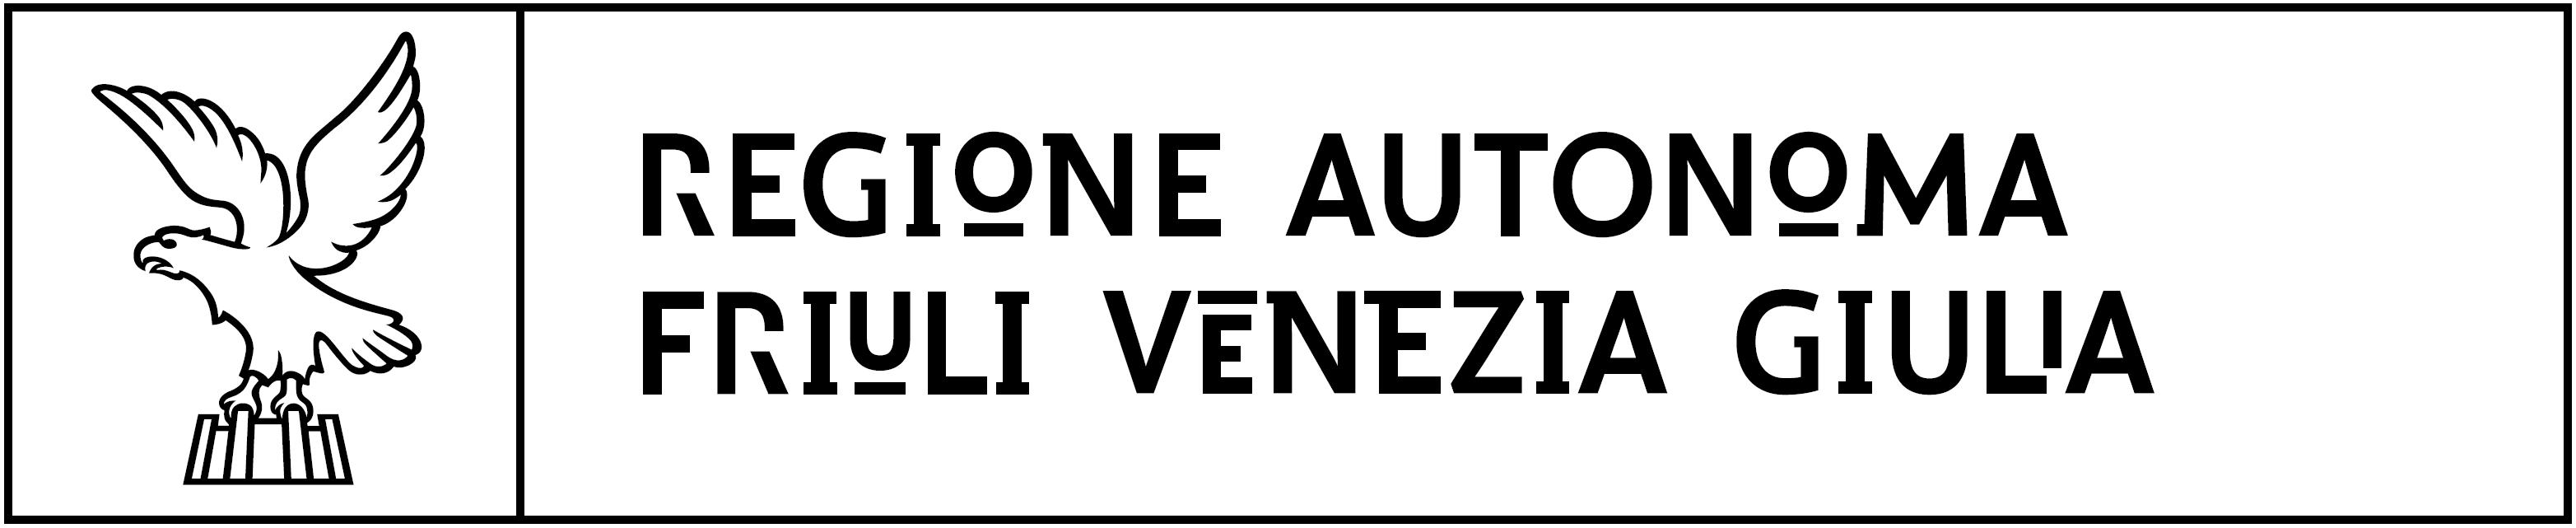 Regione-Autonoma-Friuli-Venezia-Giulia_logo